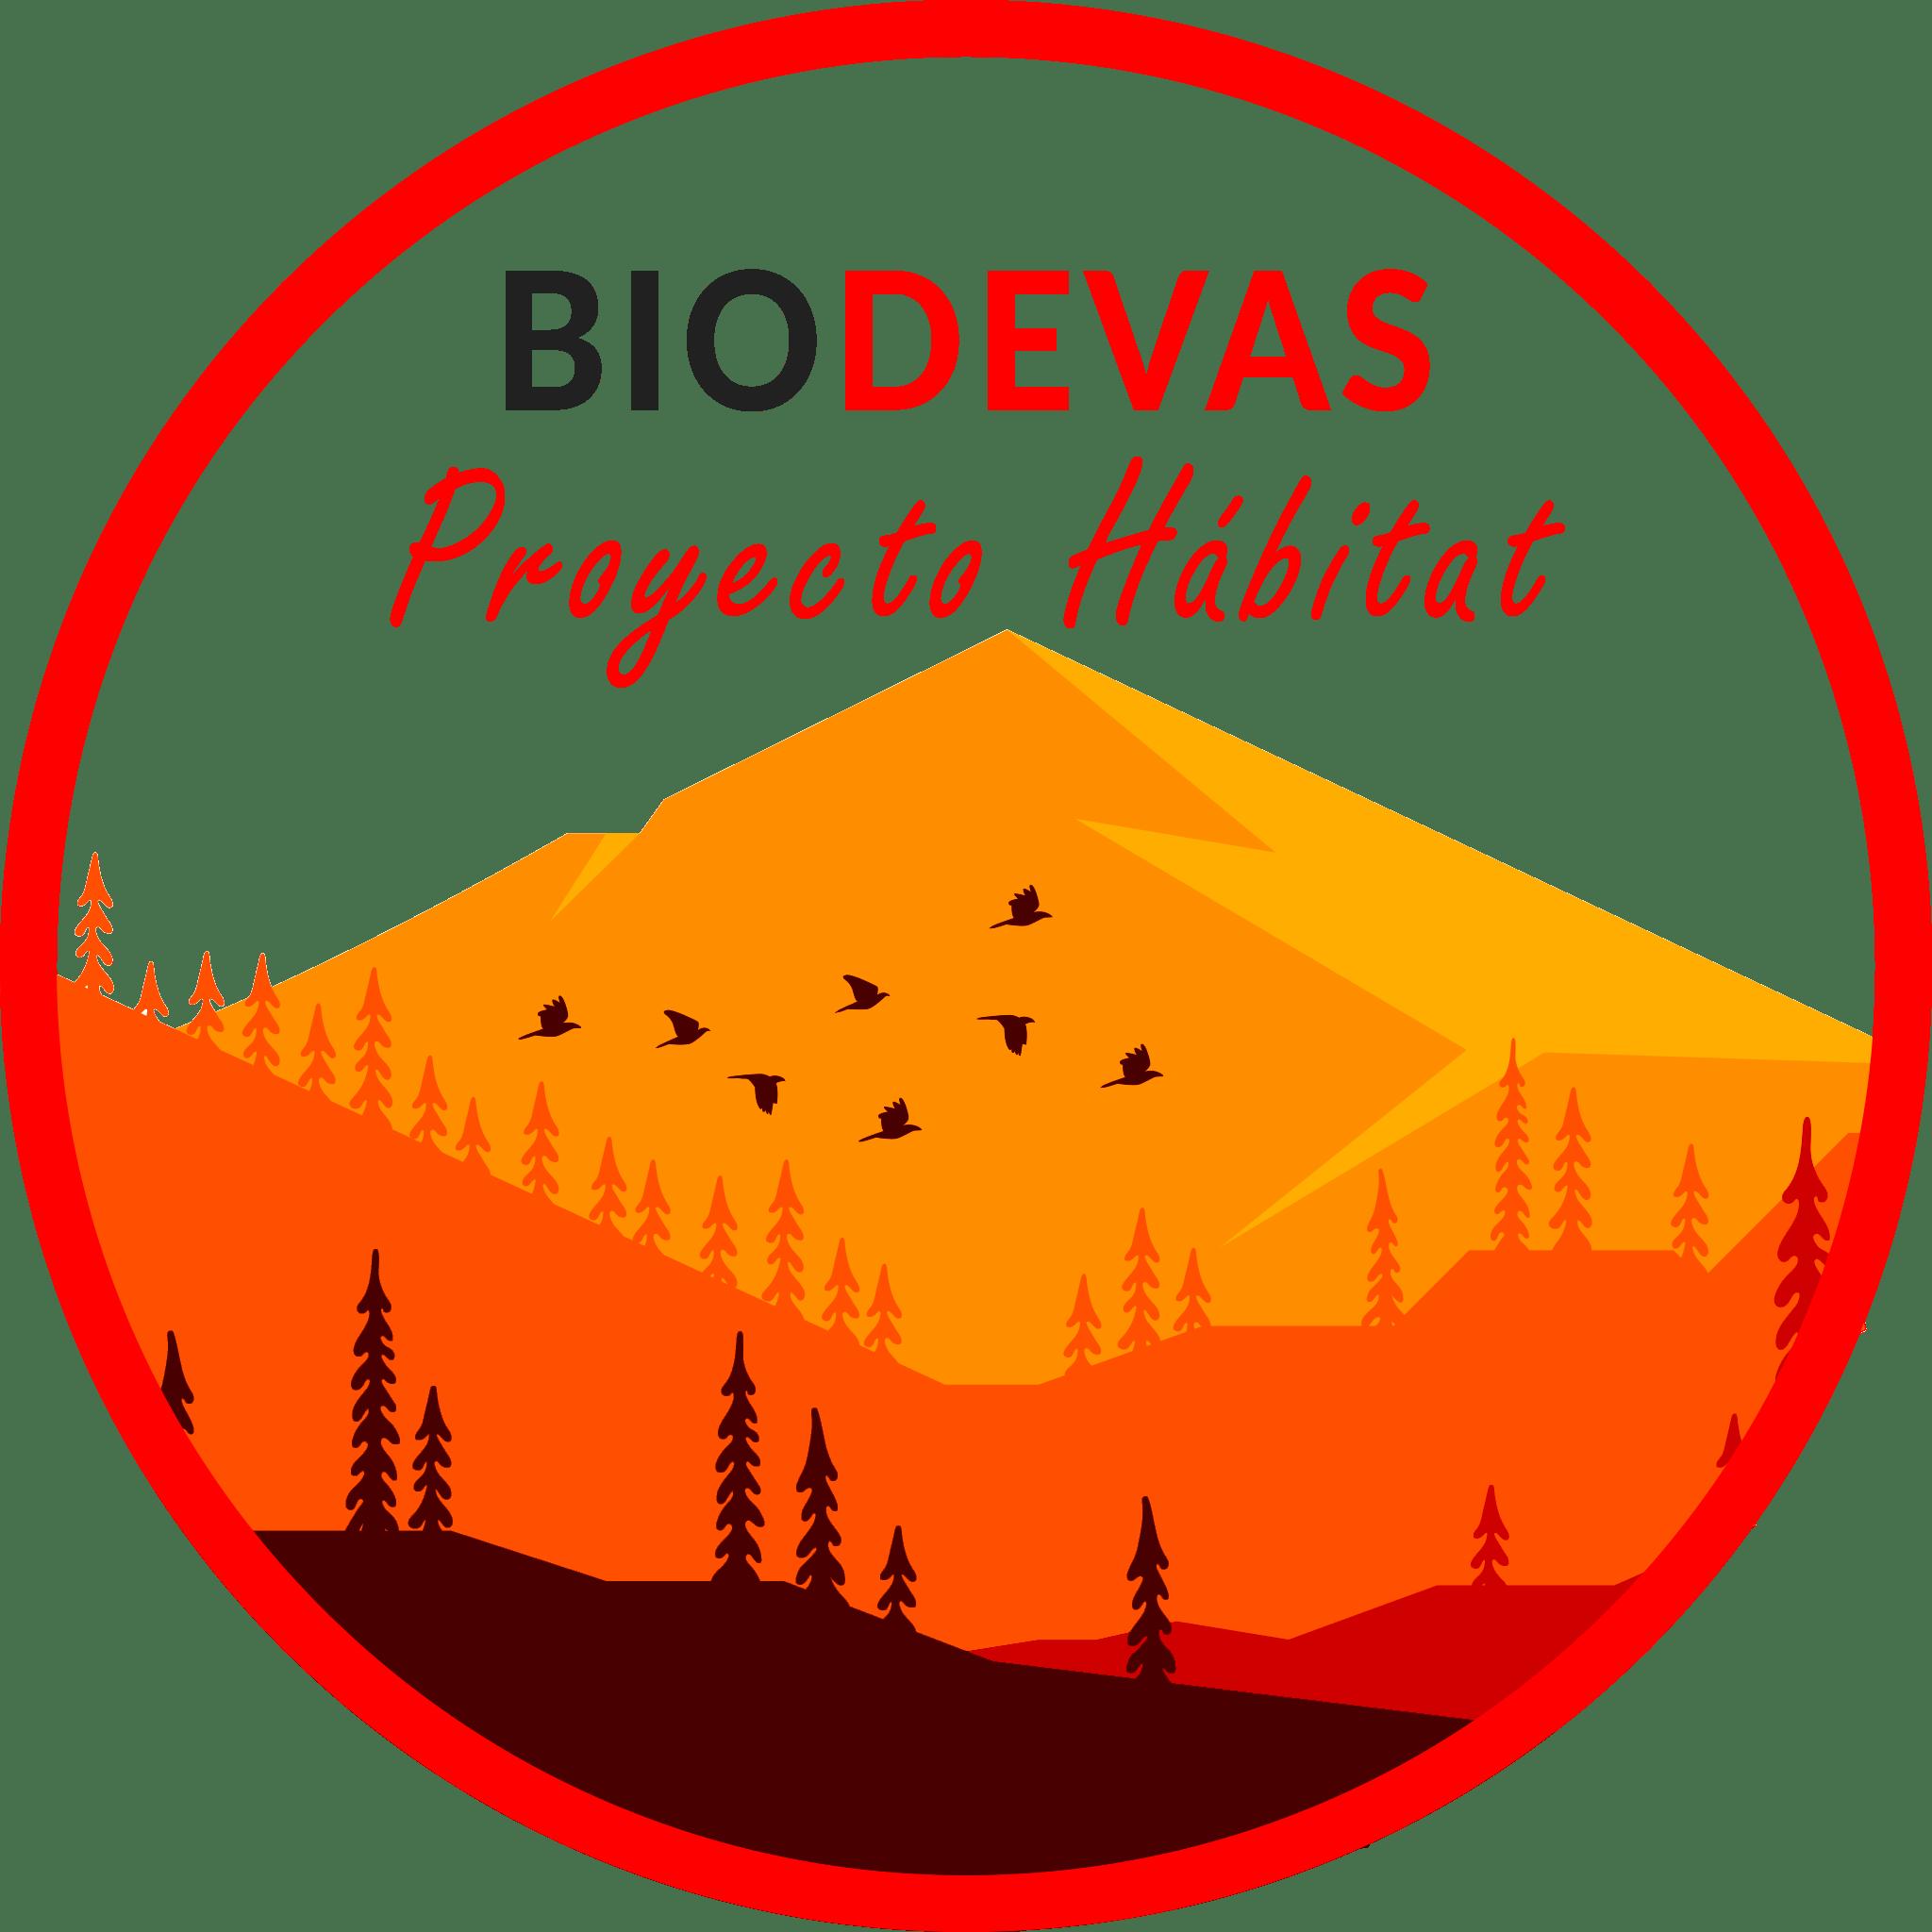 LogoBiodevas2021 circulo rojo habitat